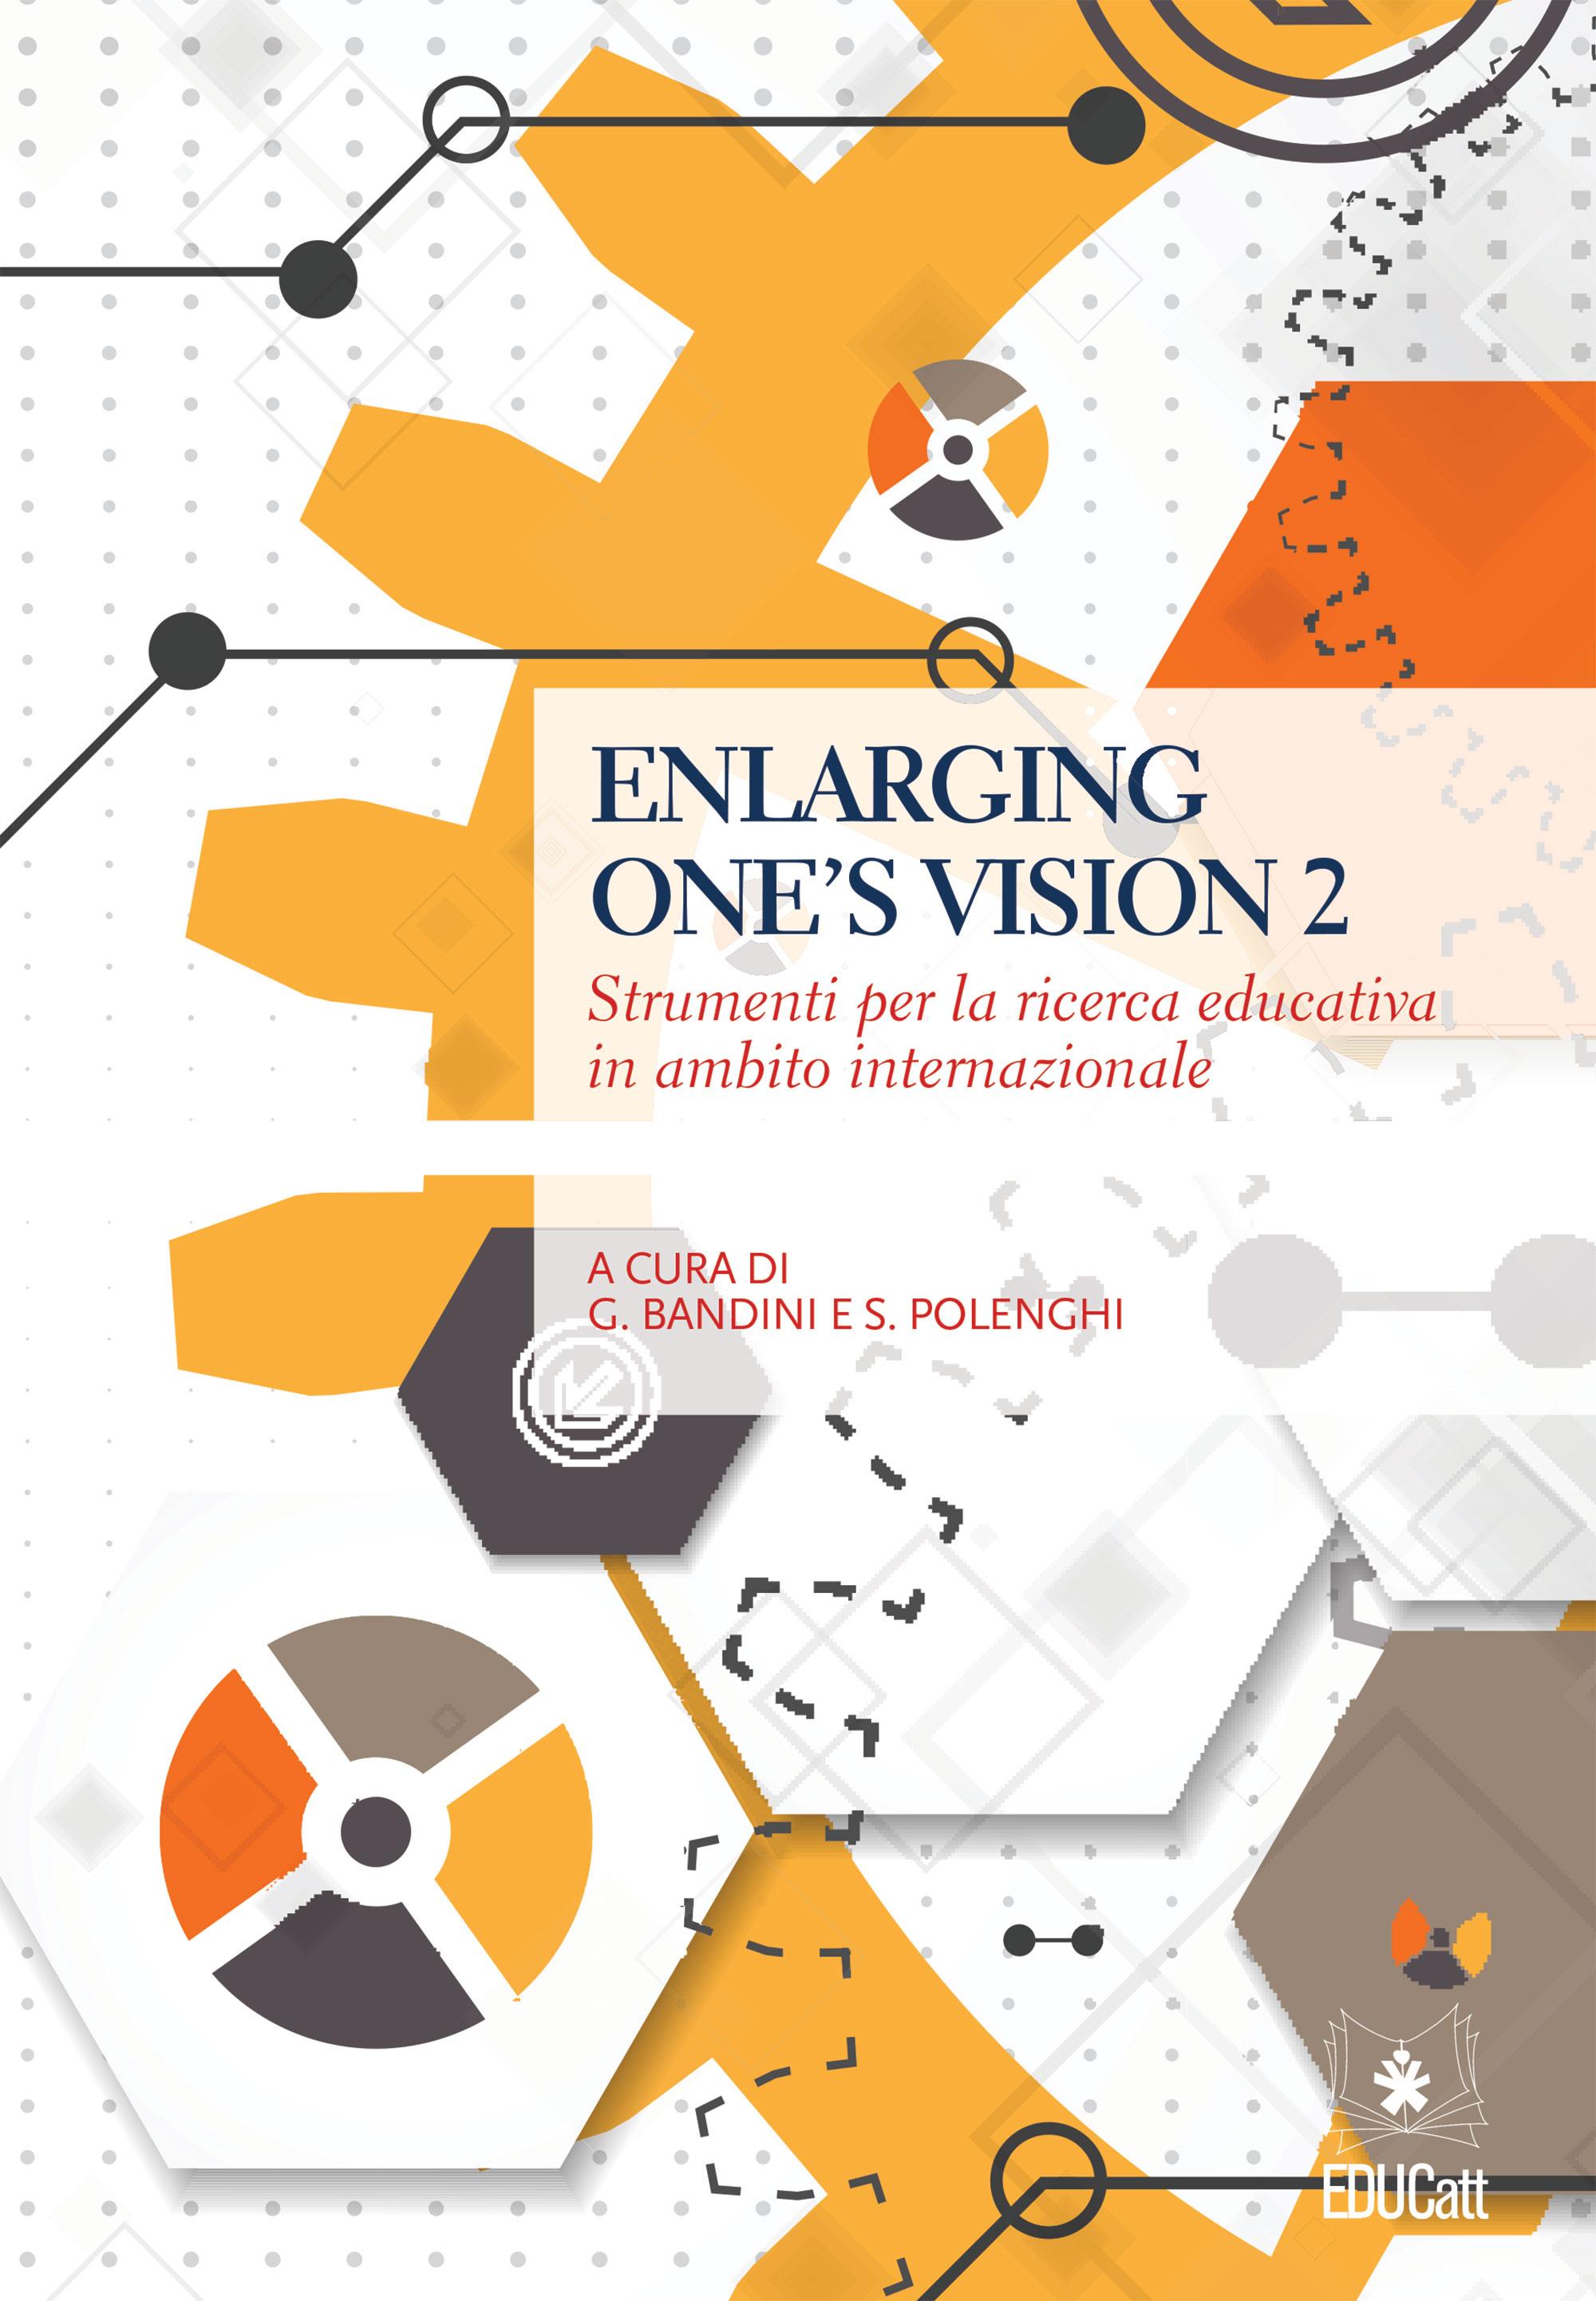 ENLARGING ONE'S VISION 2